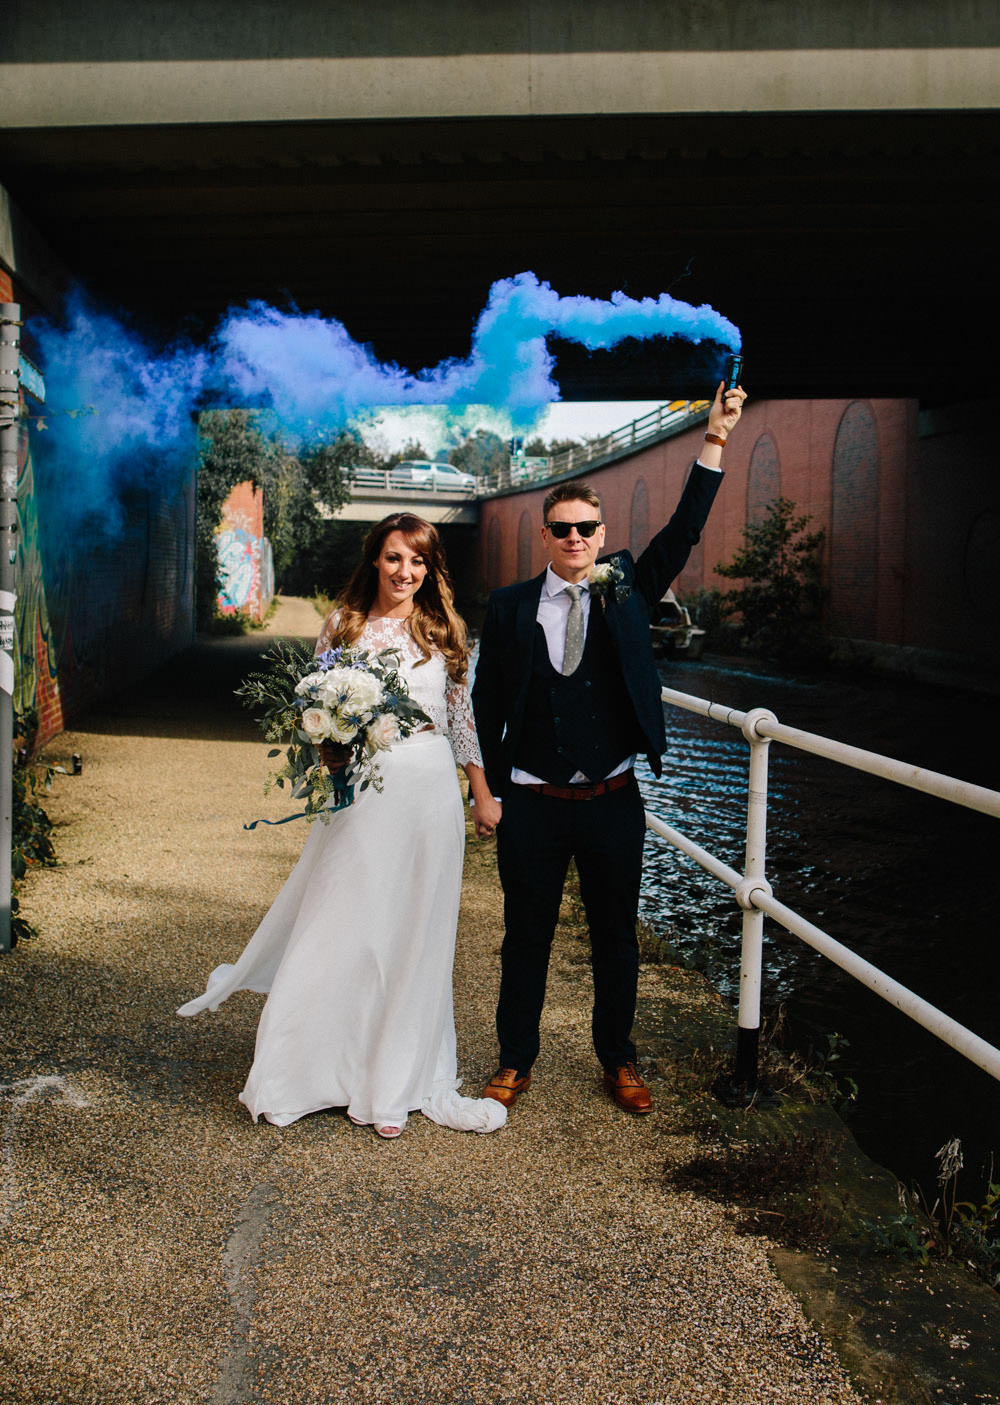 Indie Warehouse Wedding Dan Hough Photo Smoke Bomb